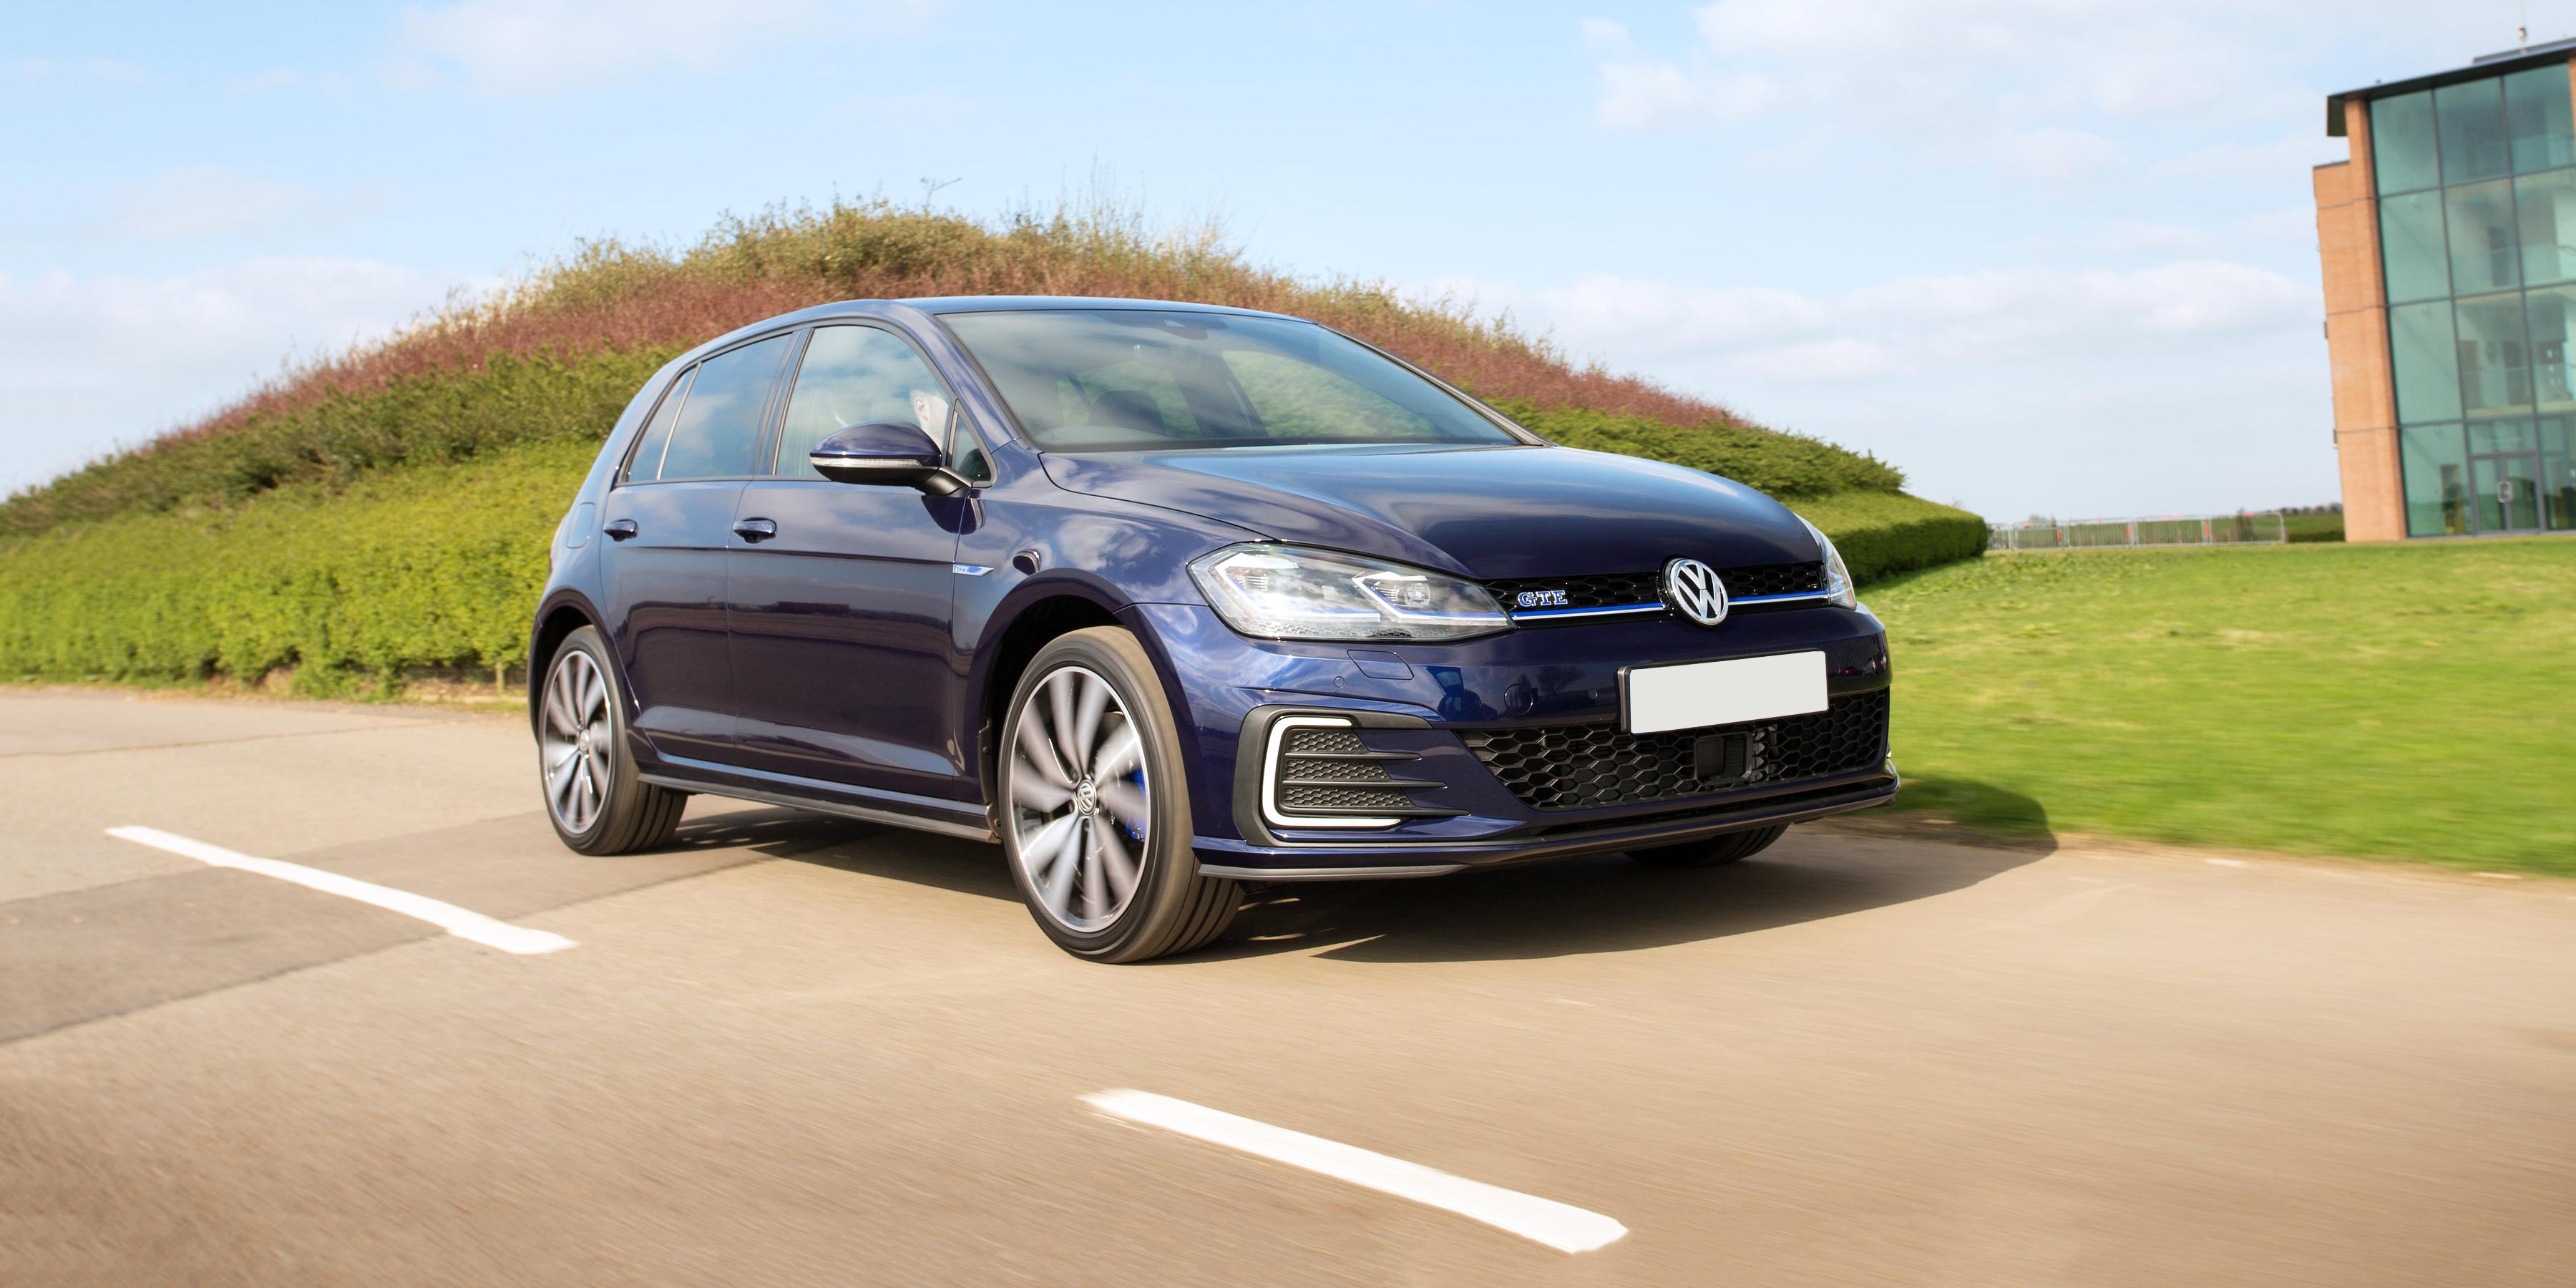 Golf Gte Test >> New Volkswagen Golf Gte Review Carwow